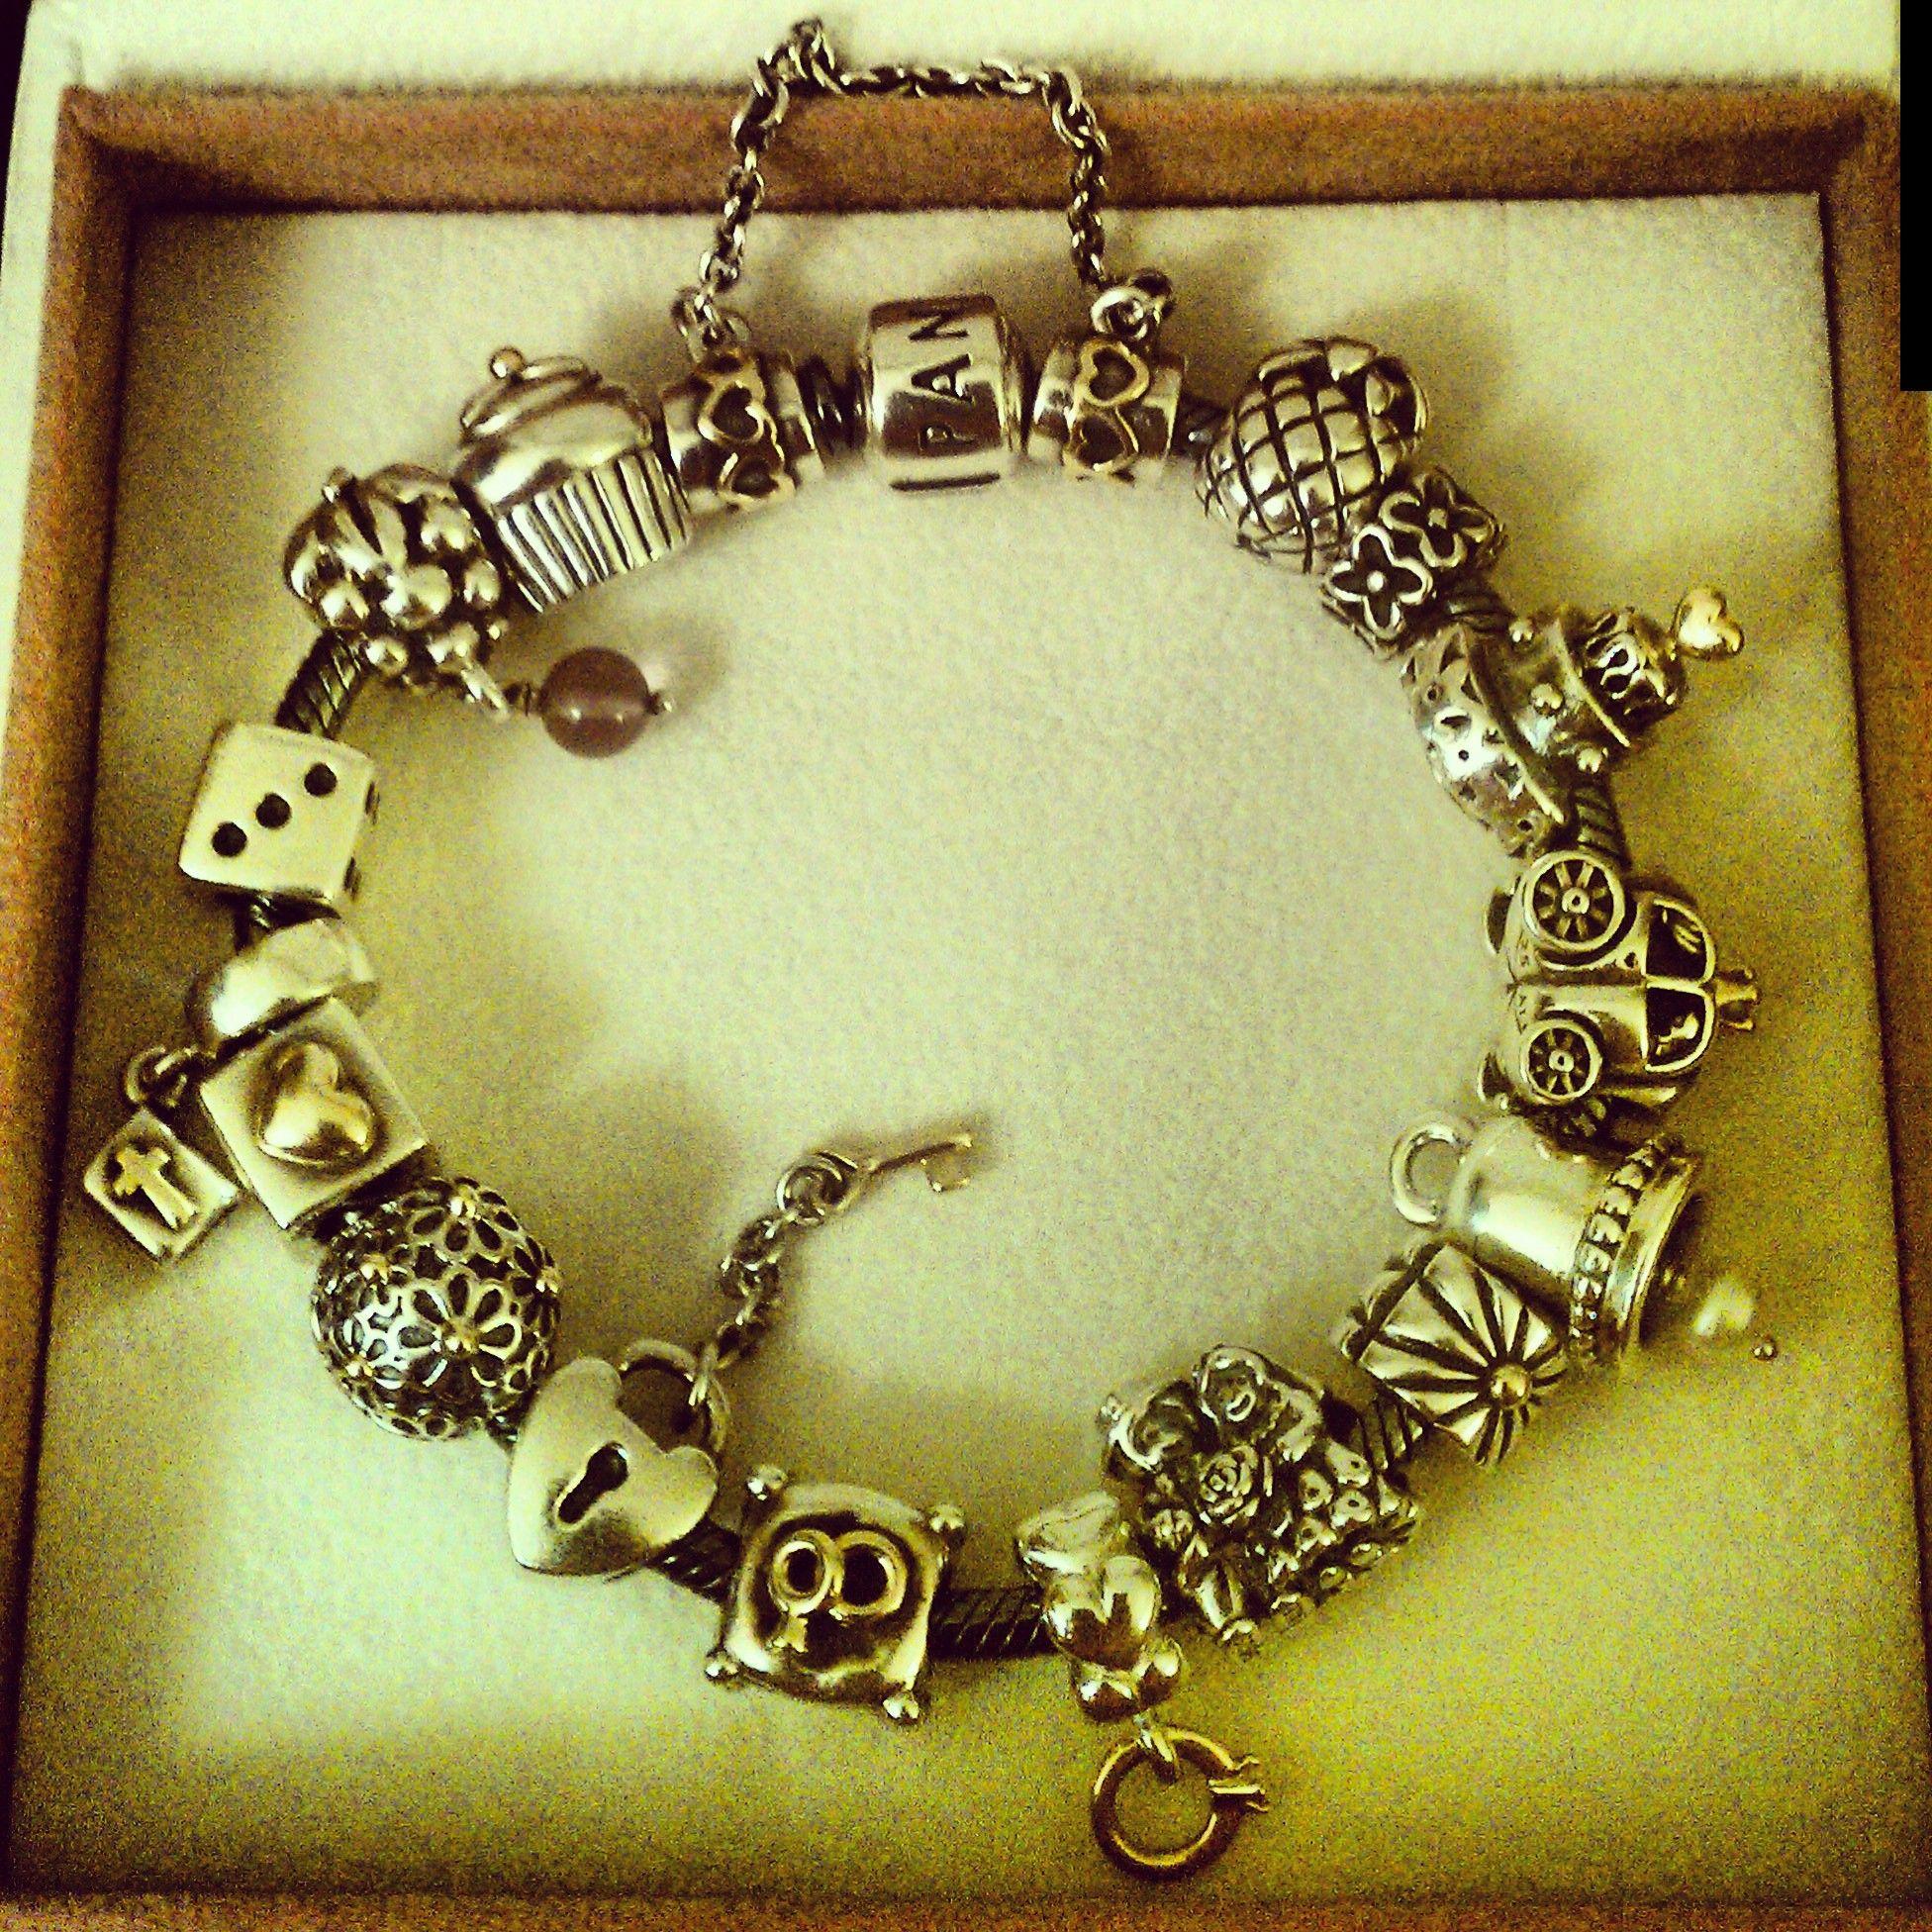 Dating charm bracelet story